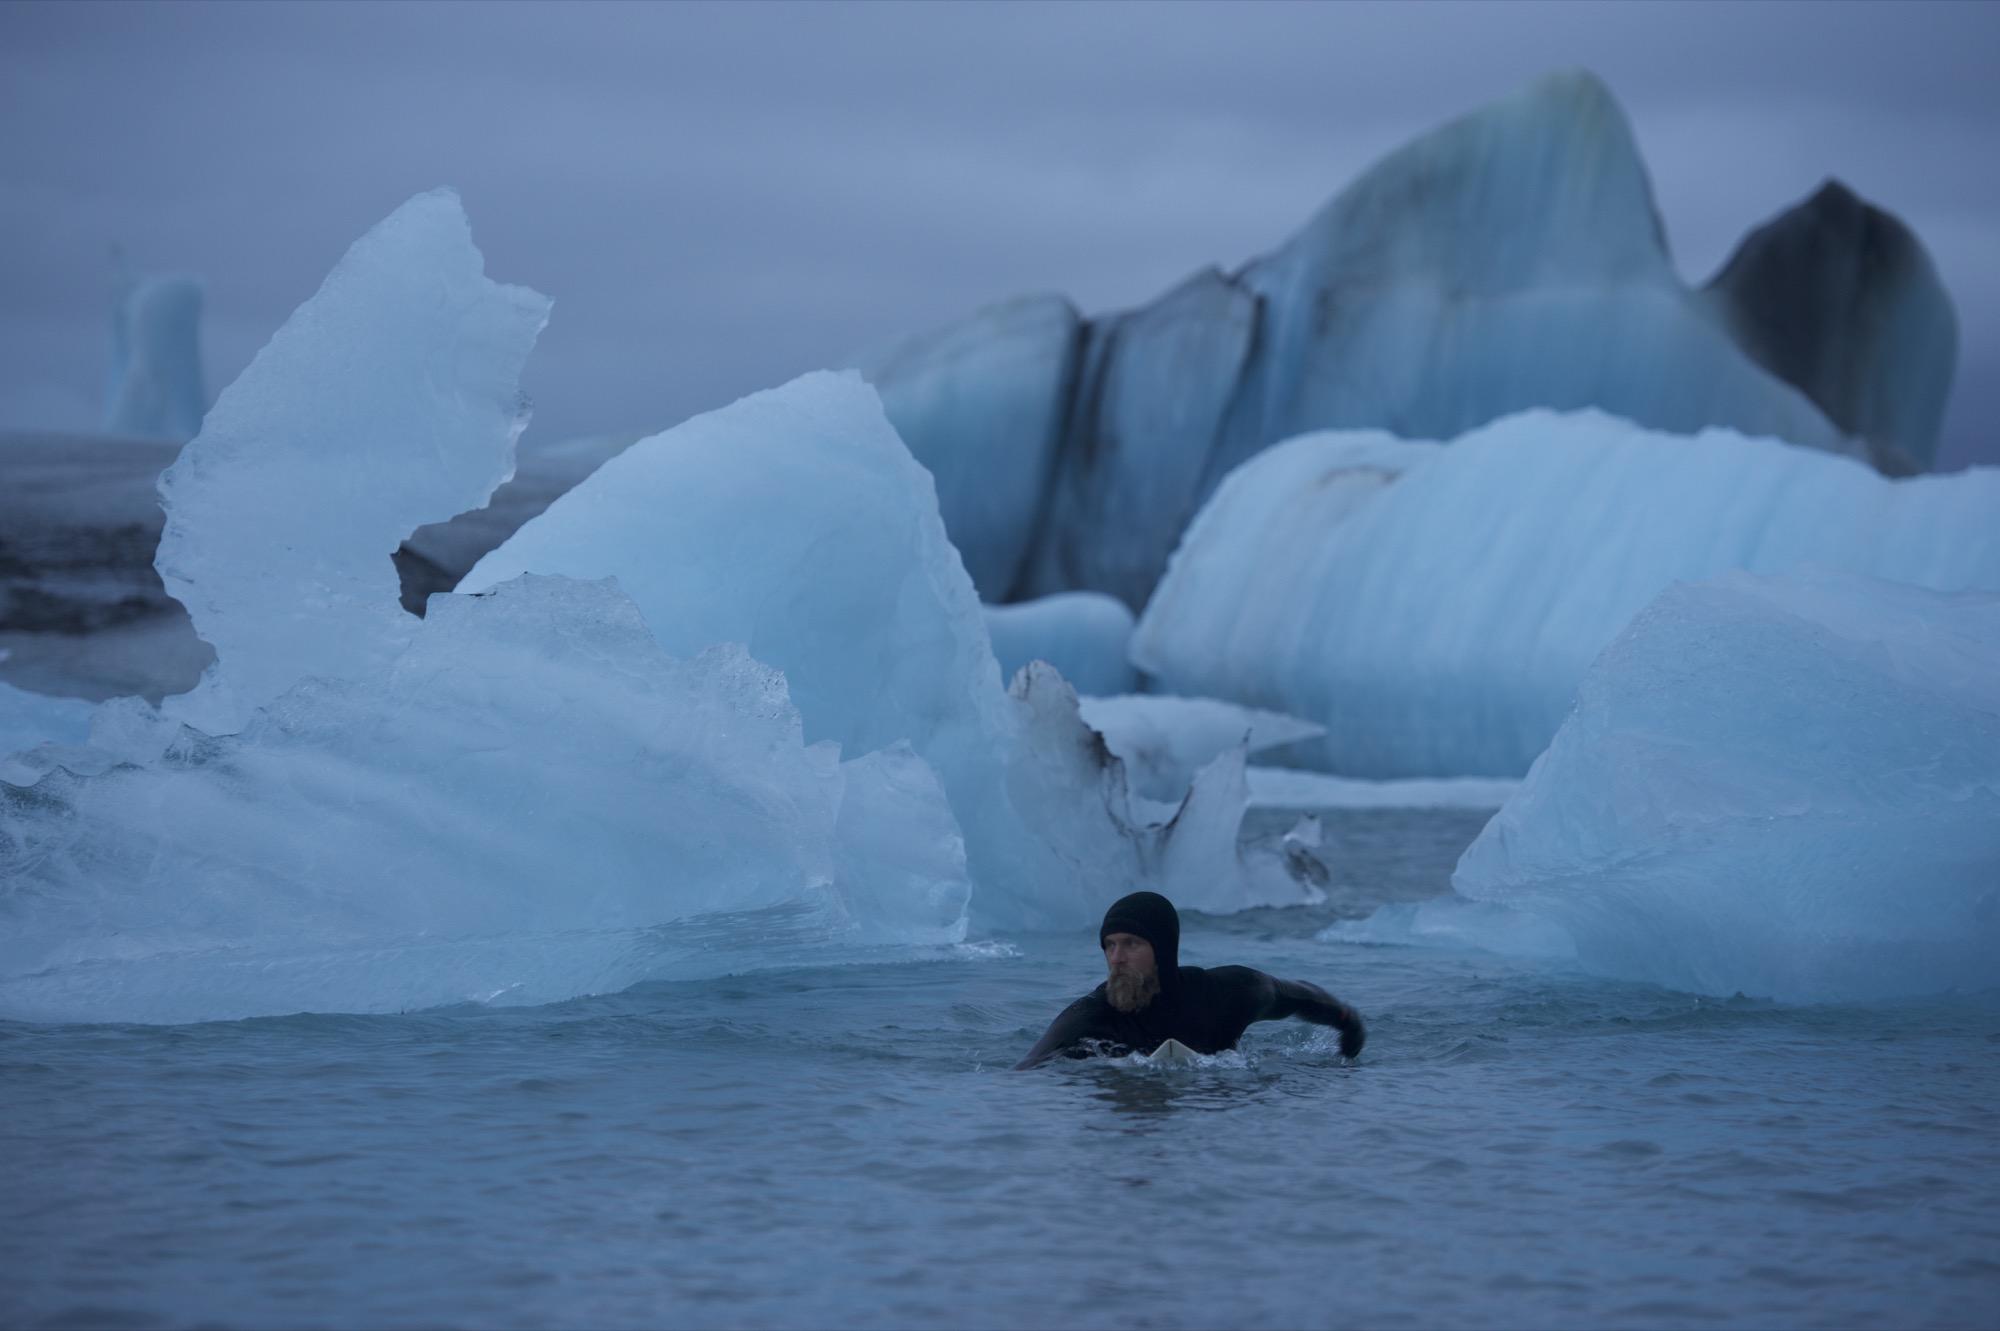 Keith Malloy, Jökulsárlón Glacier Lagoon Water temp: 34° F / 1° C Air temp: 29° F / -2° C Photo by Chris Burkard